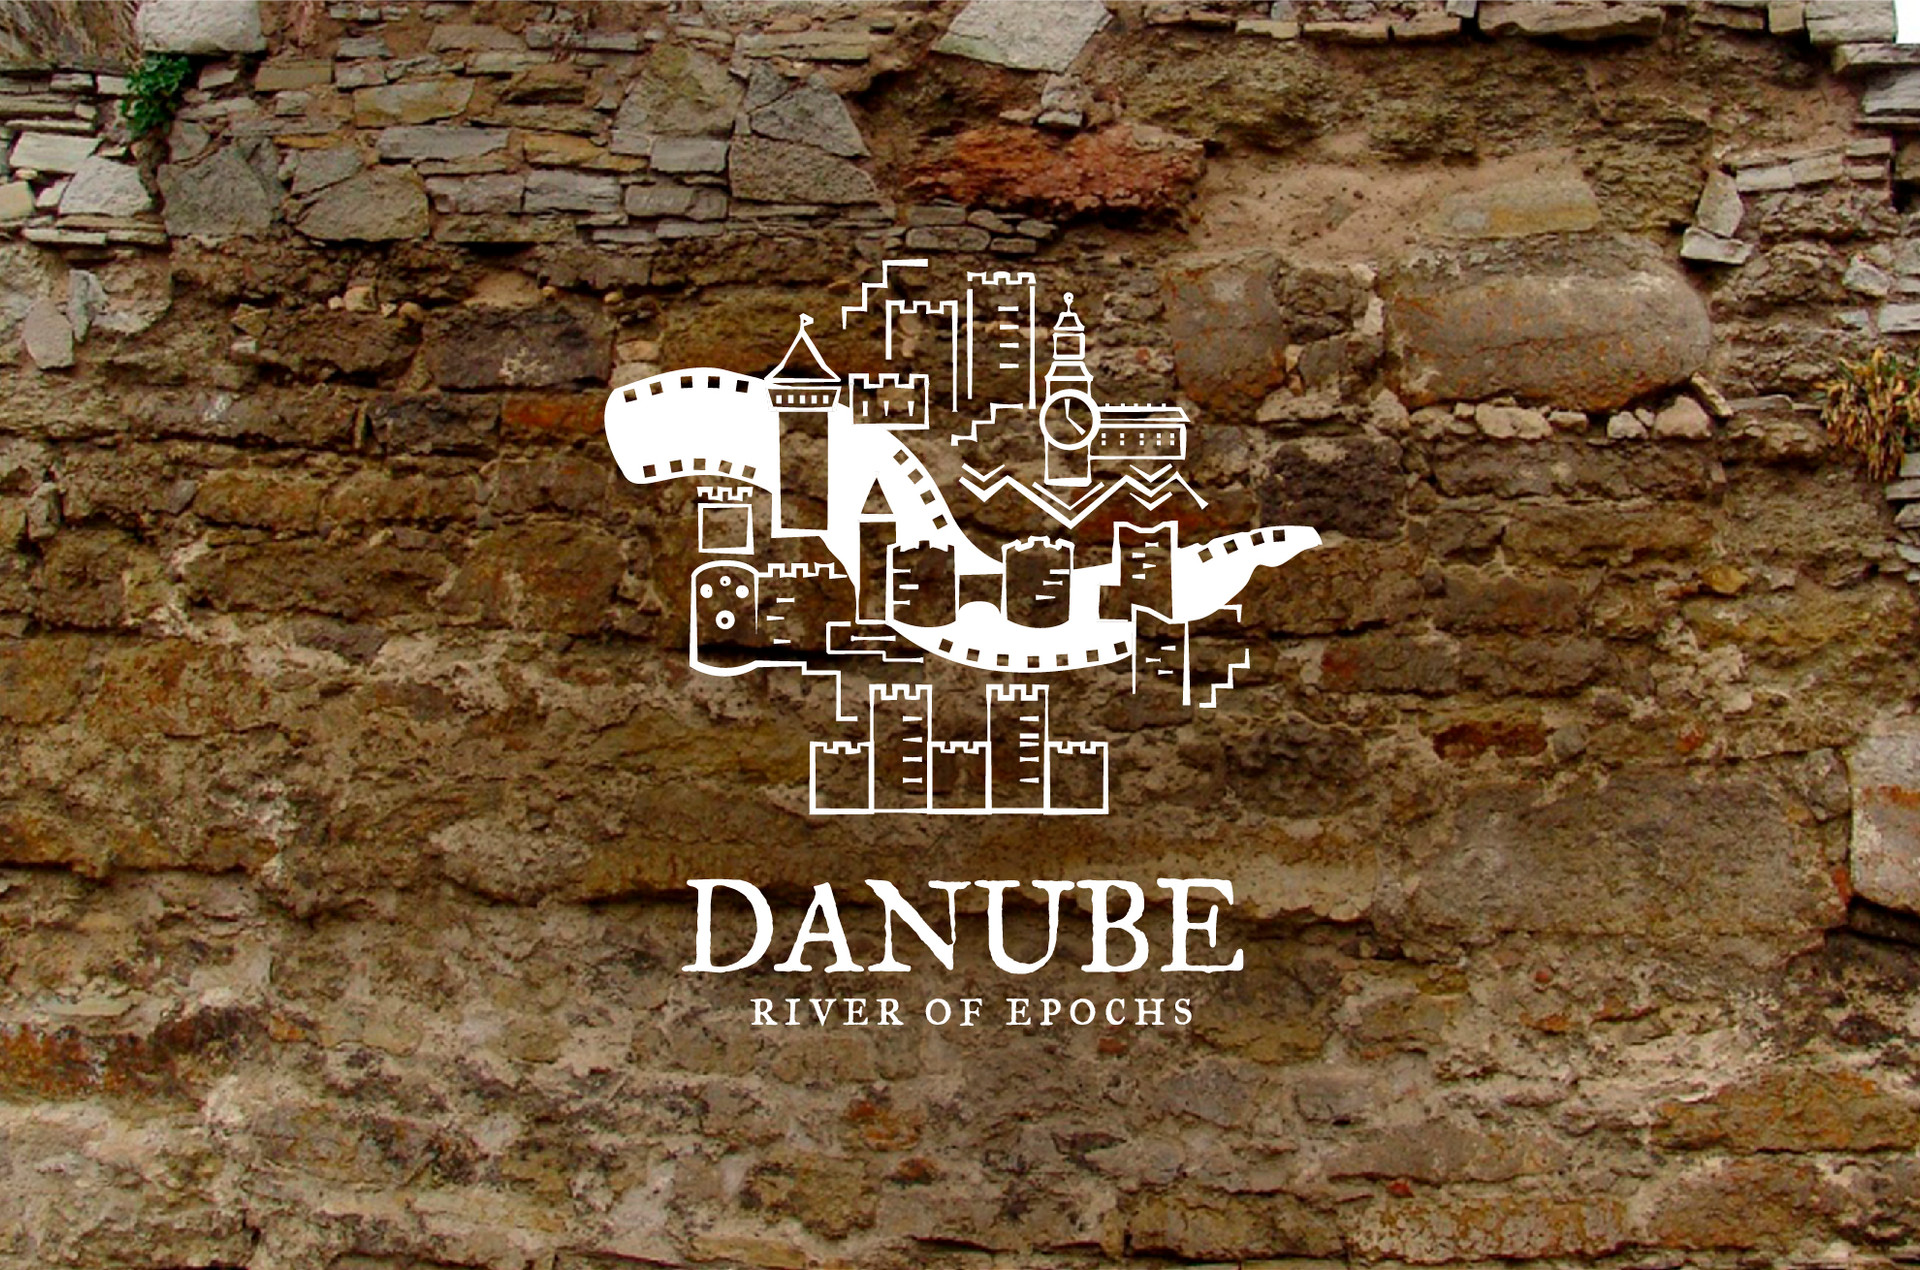 danube za behance_Artboard 12 copy 5.jpg